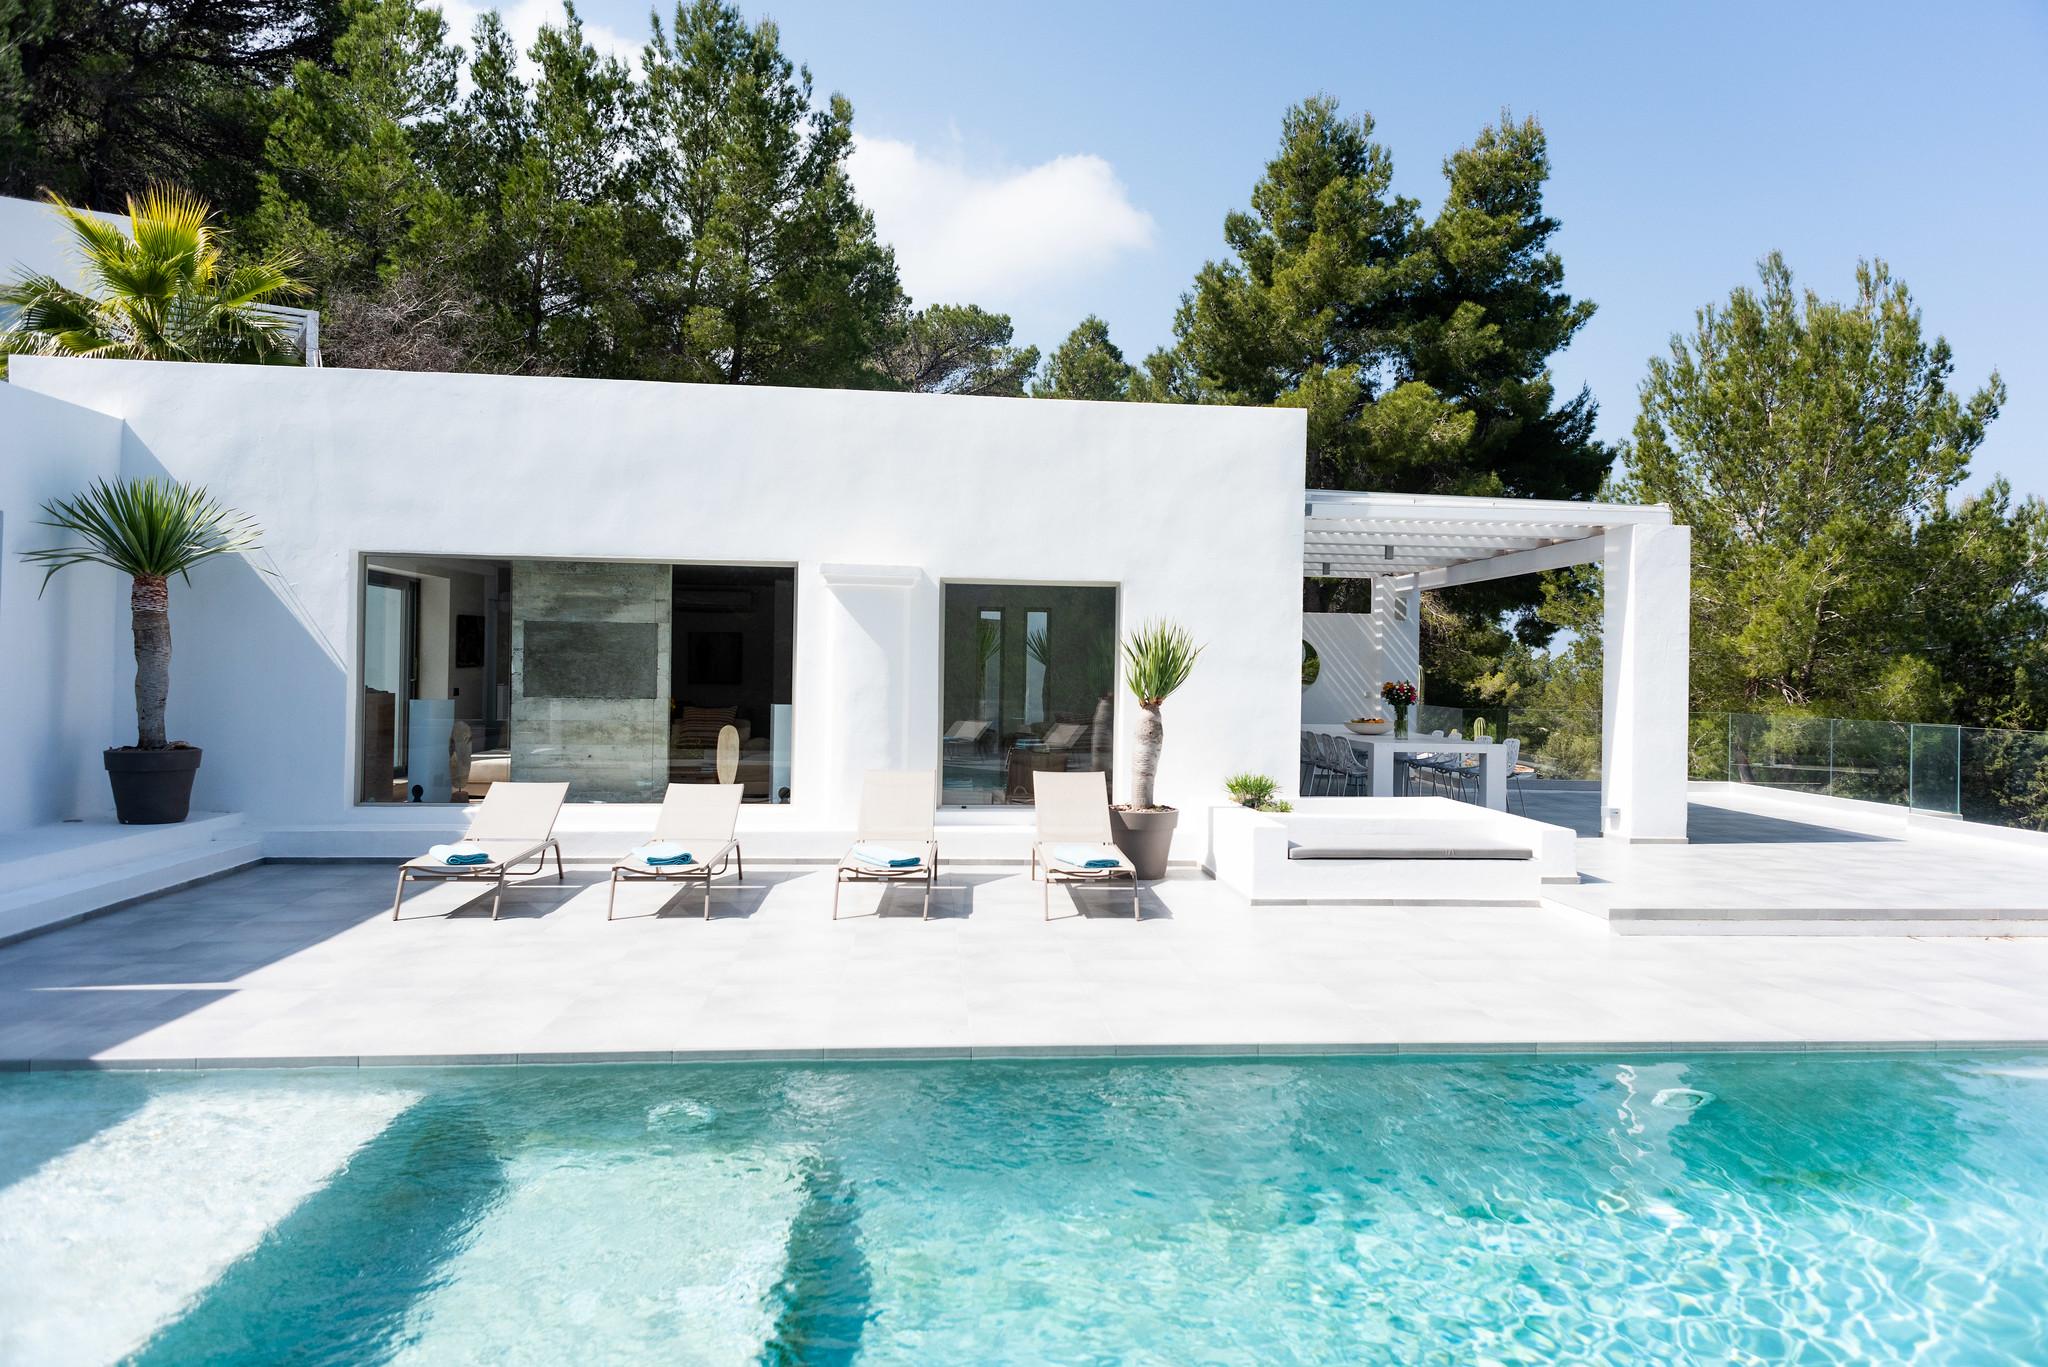 https://www.white-ibiza.com/wp-content/uploads/2020/05/white-ibiza-villas-can-dela-view-into-house.jpg